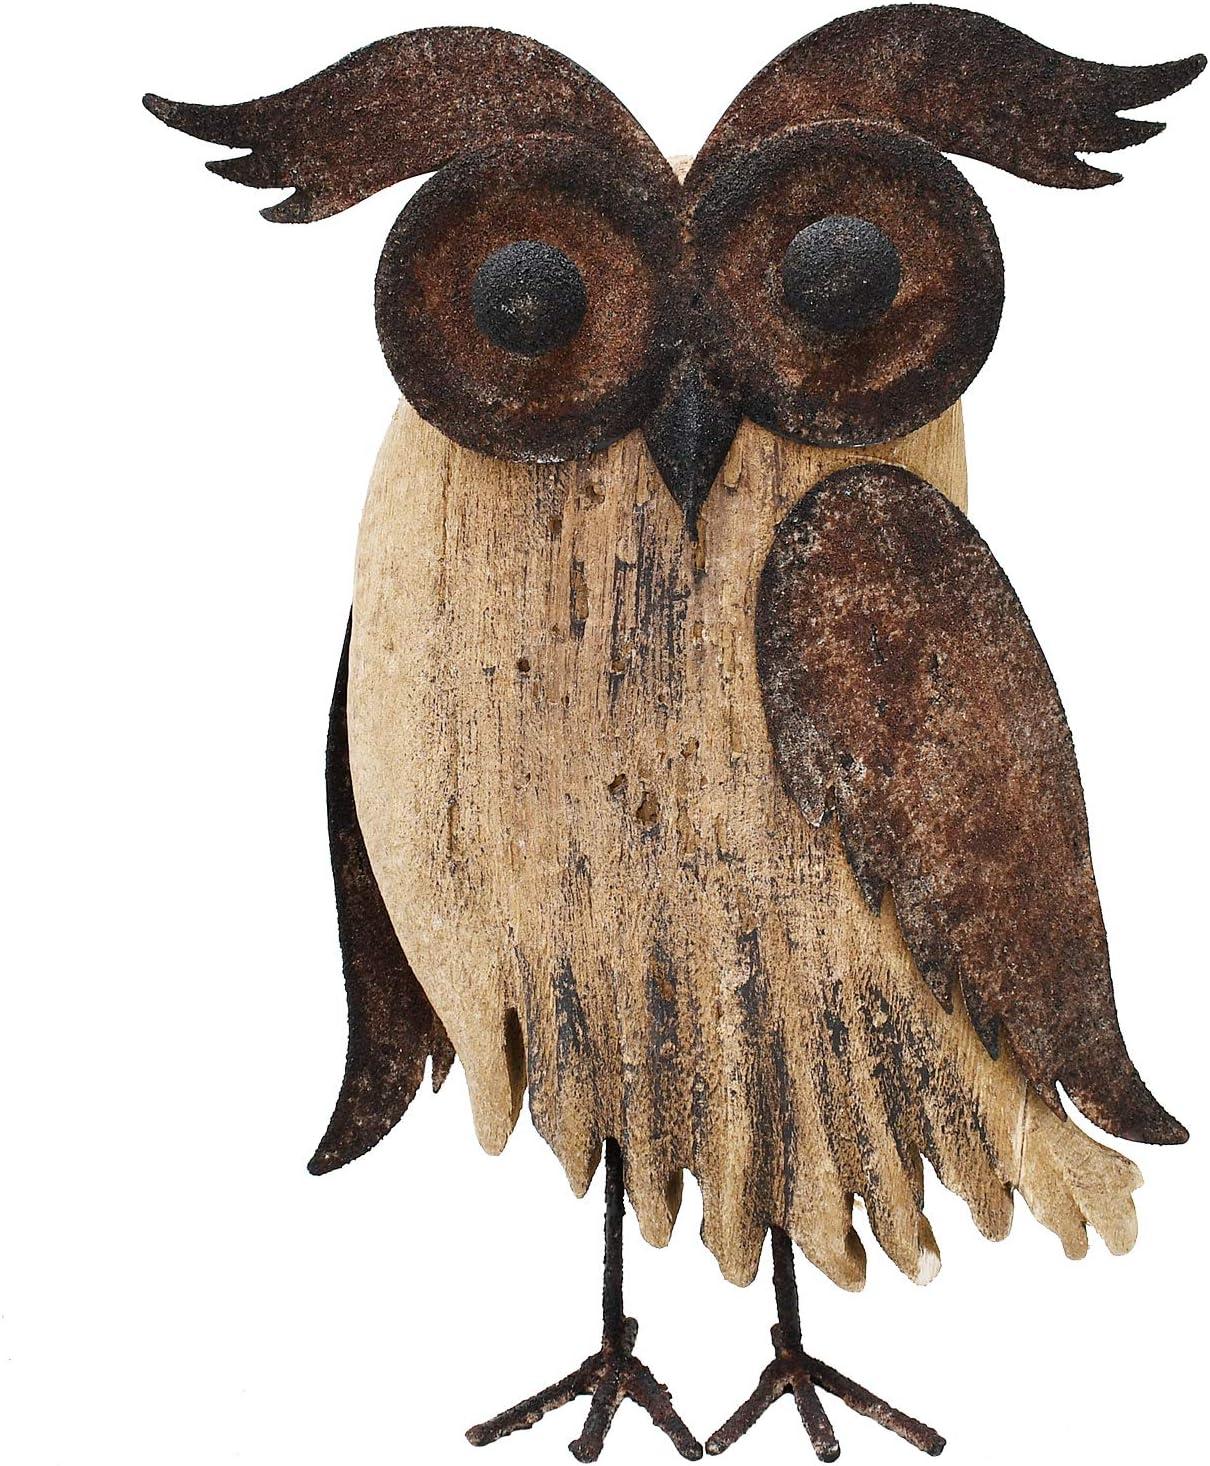 Wood Bird Figurine Home Decor Accent, Rustic Bird Statue Tabletop Decoration Owl Decor for Living Room Bedroom Office Decoration, Abstract Bird Figurine Spring Summer Autumn Decor (Rust Color B)